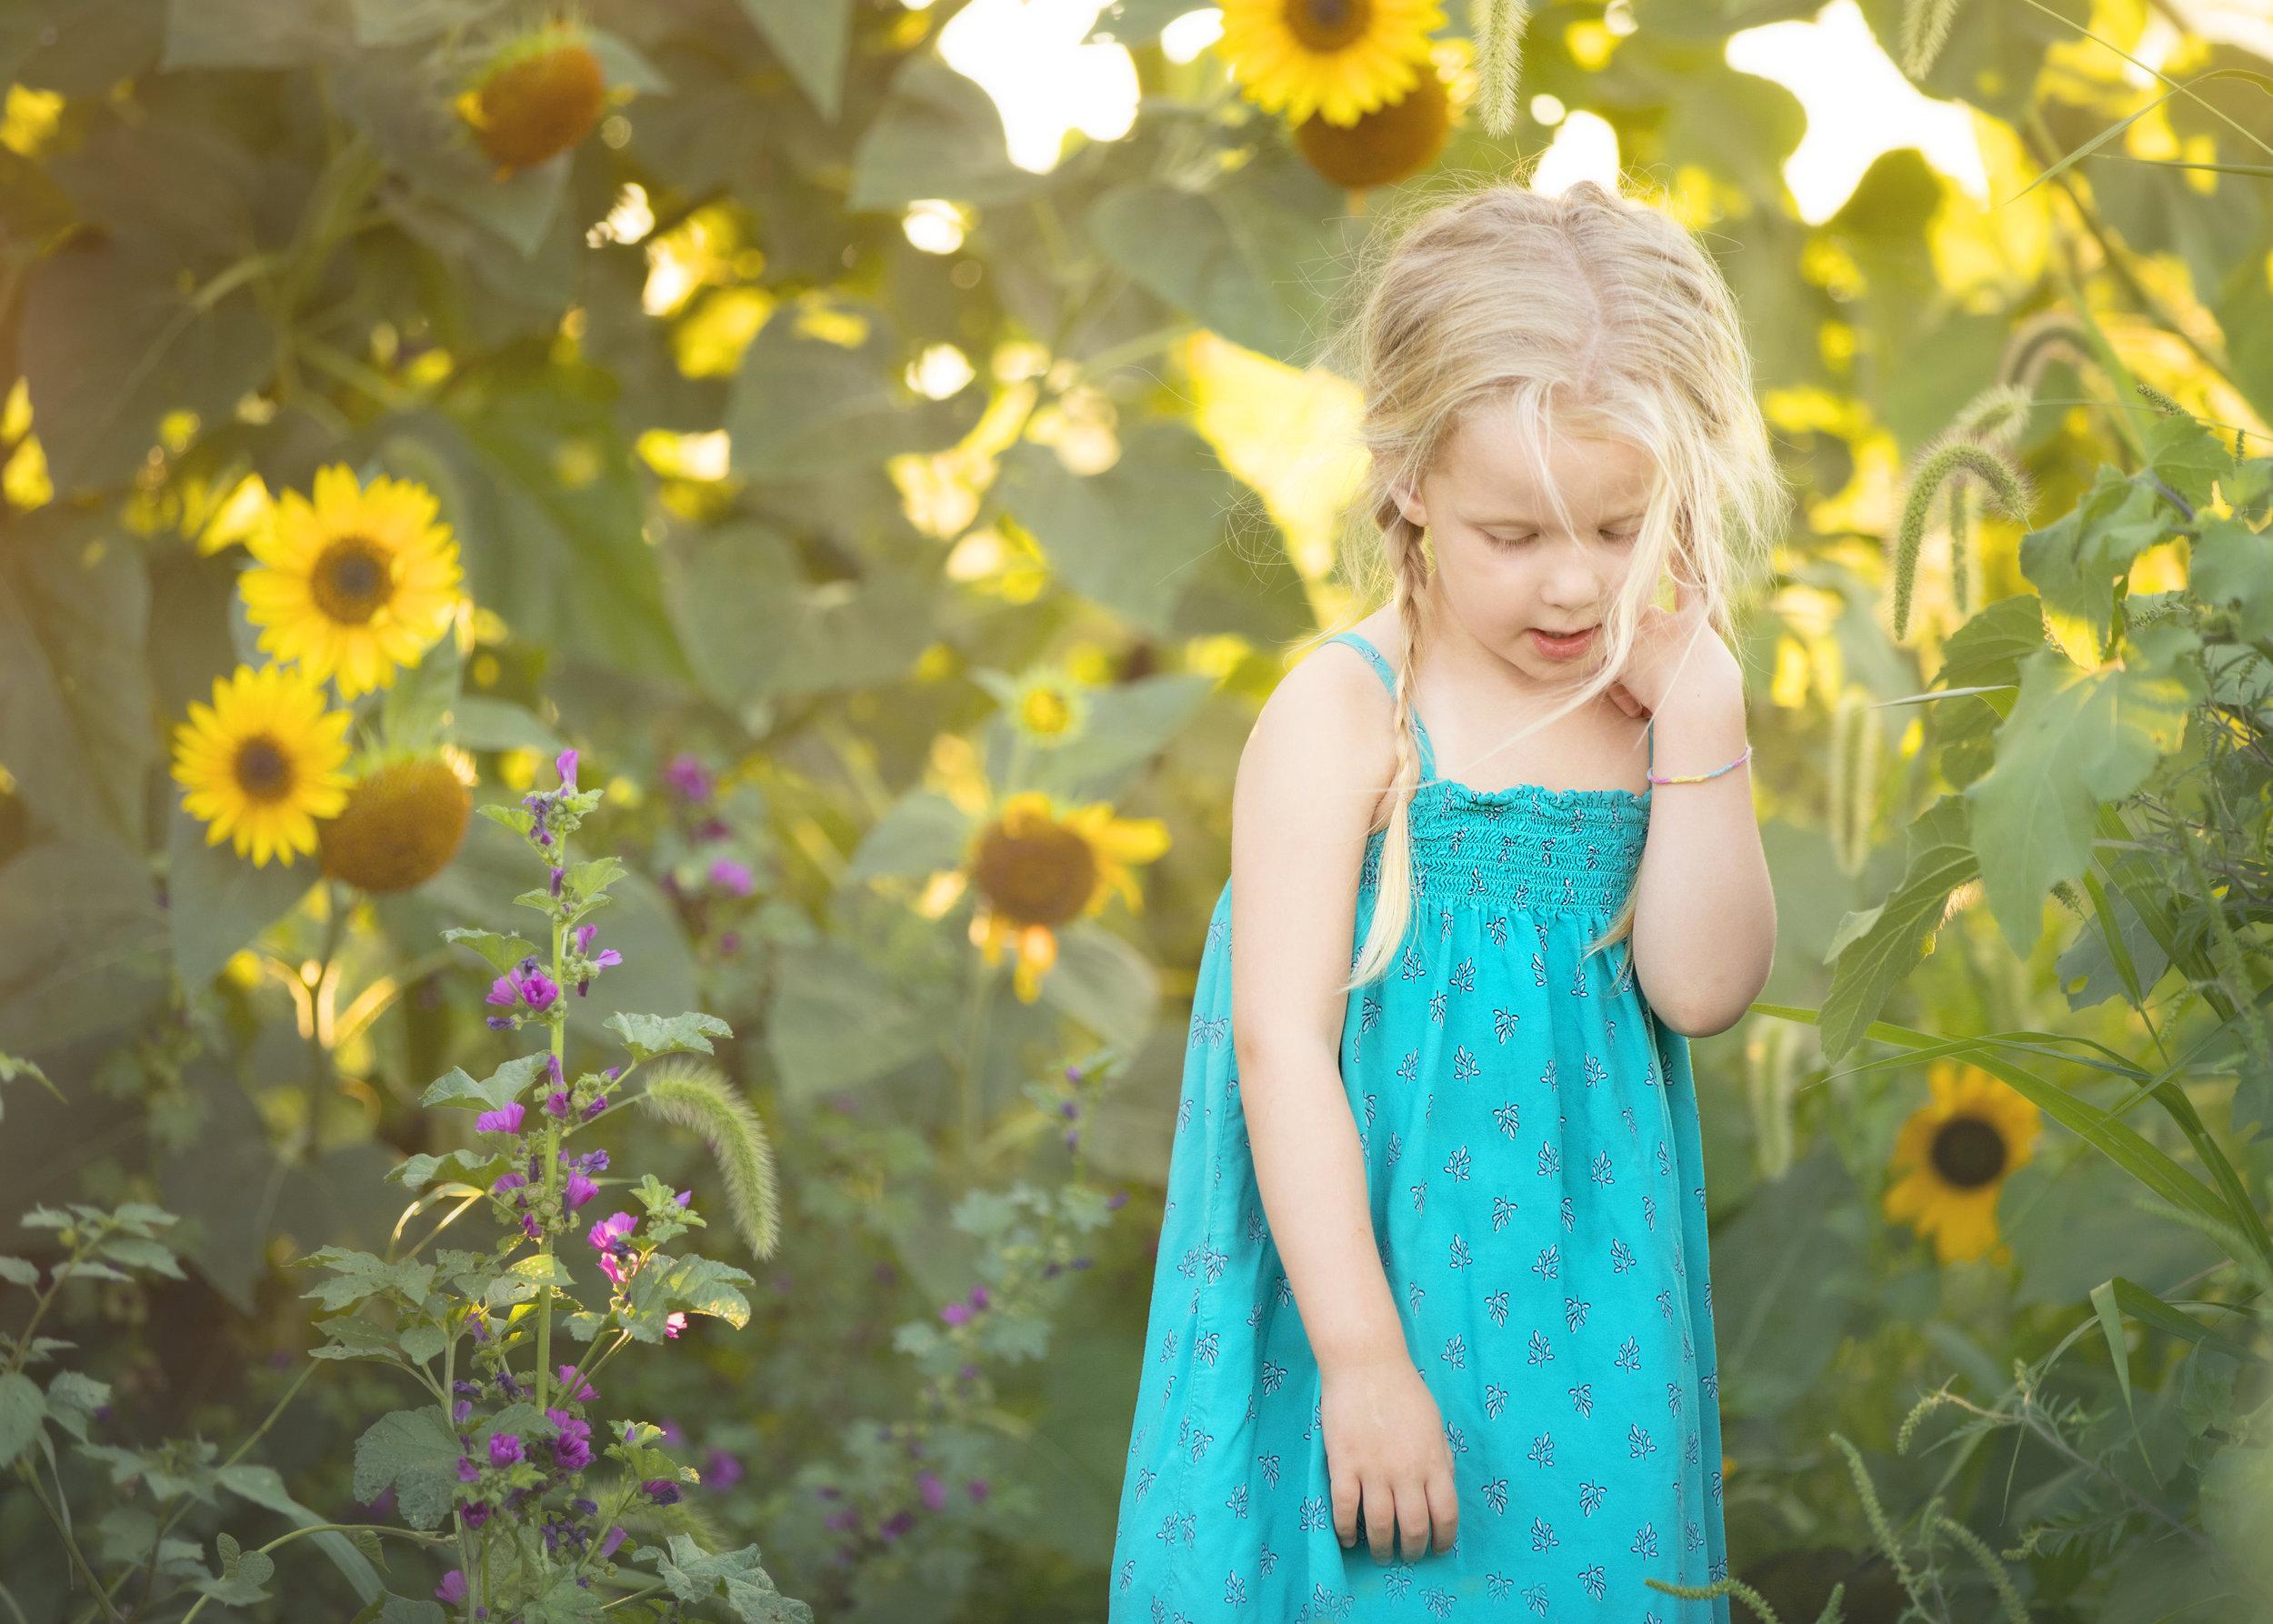 Sunflowers_TO EDIT_August2018IMG_5998.jpg